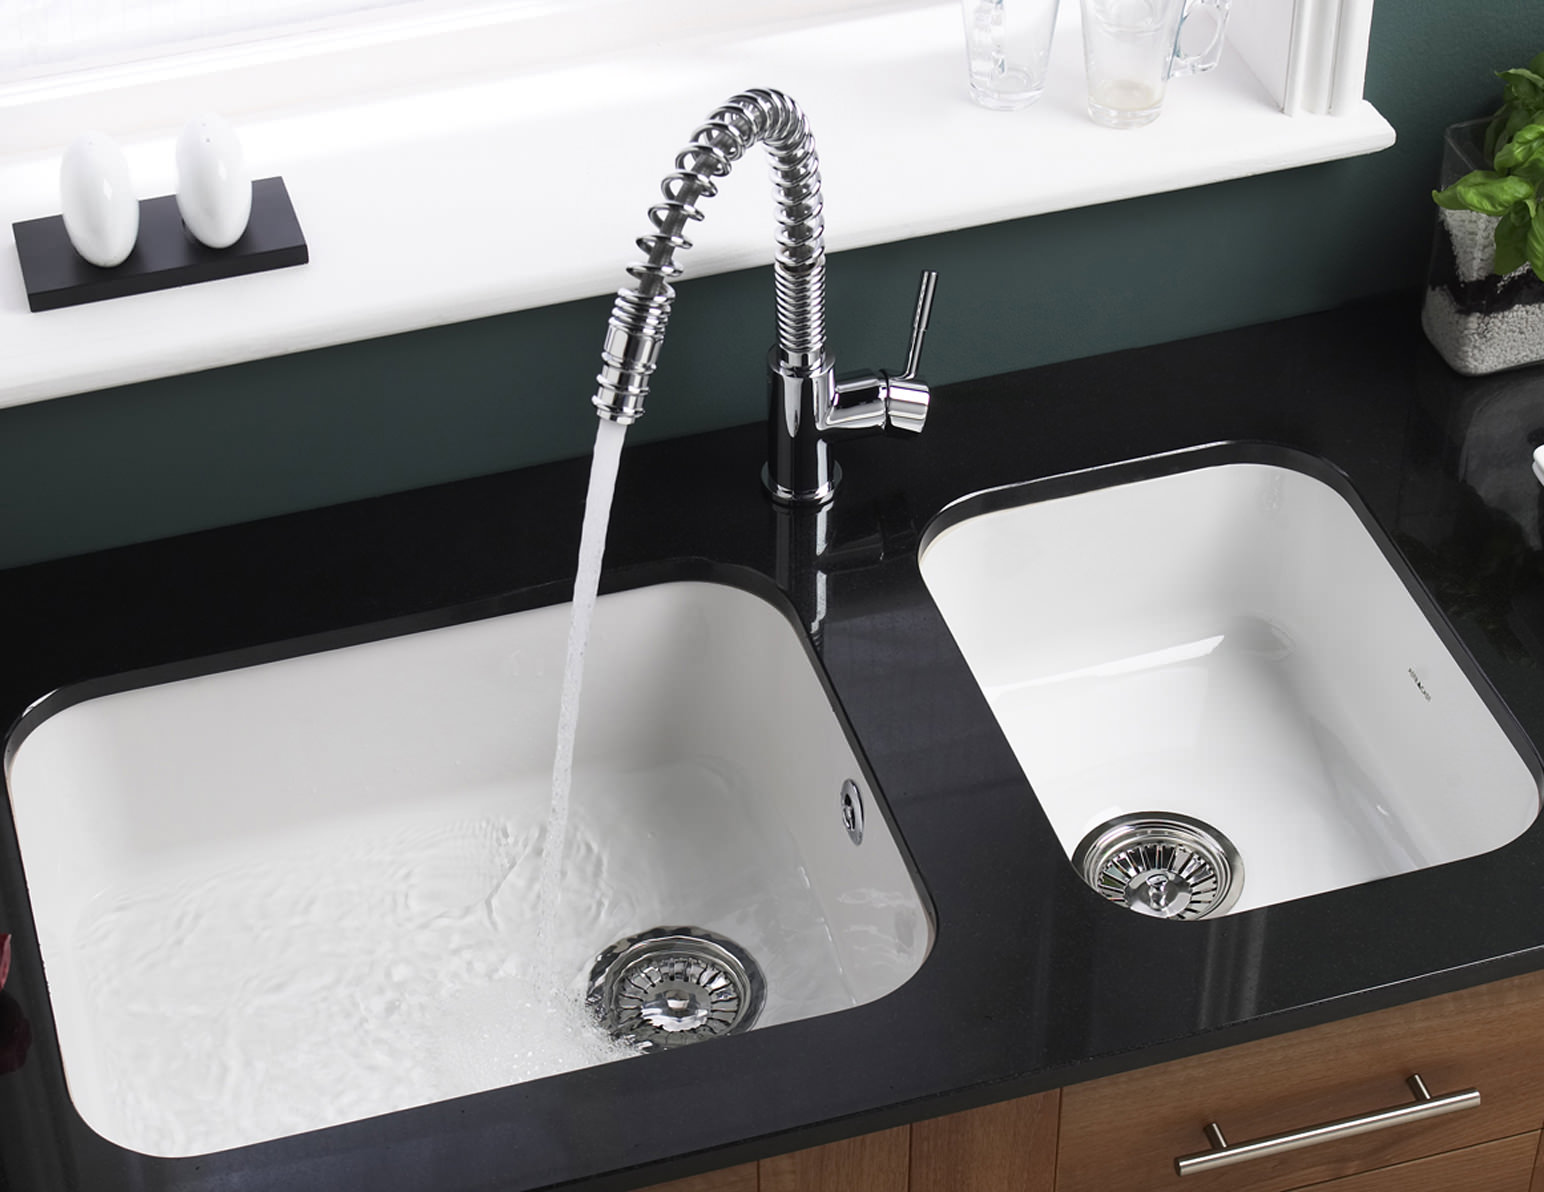 Bon Astracast Lincoln 3040 Gloss White Ceramic Undermount Sink   Main Bowl